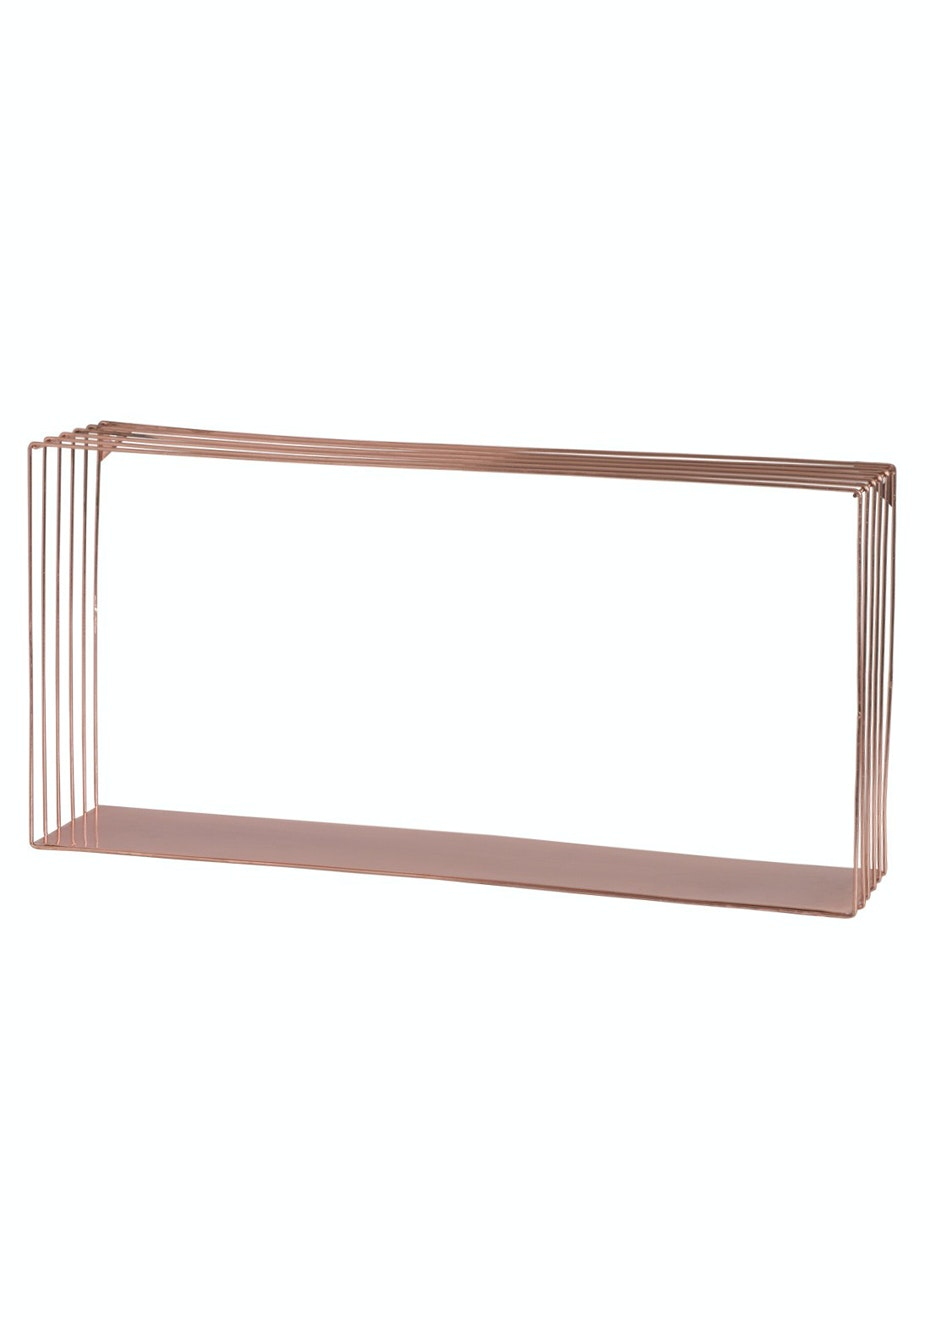 Jason - Copper shelf